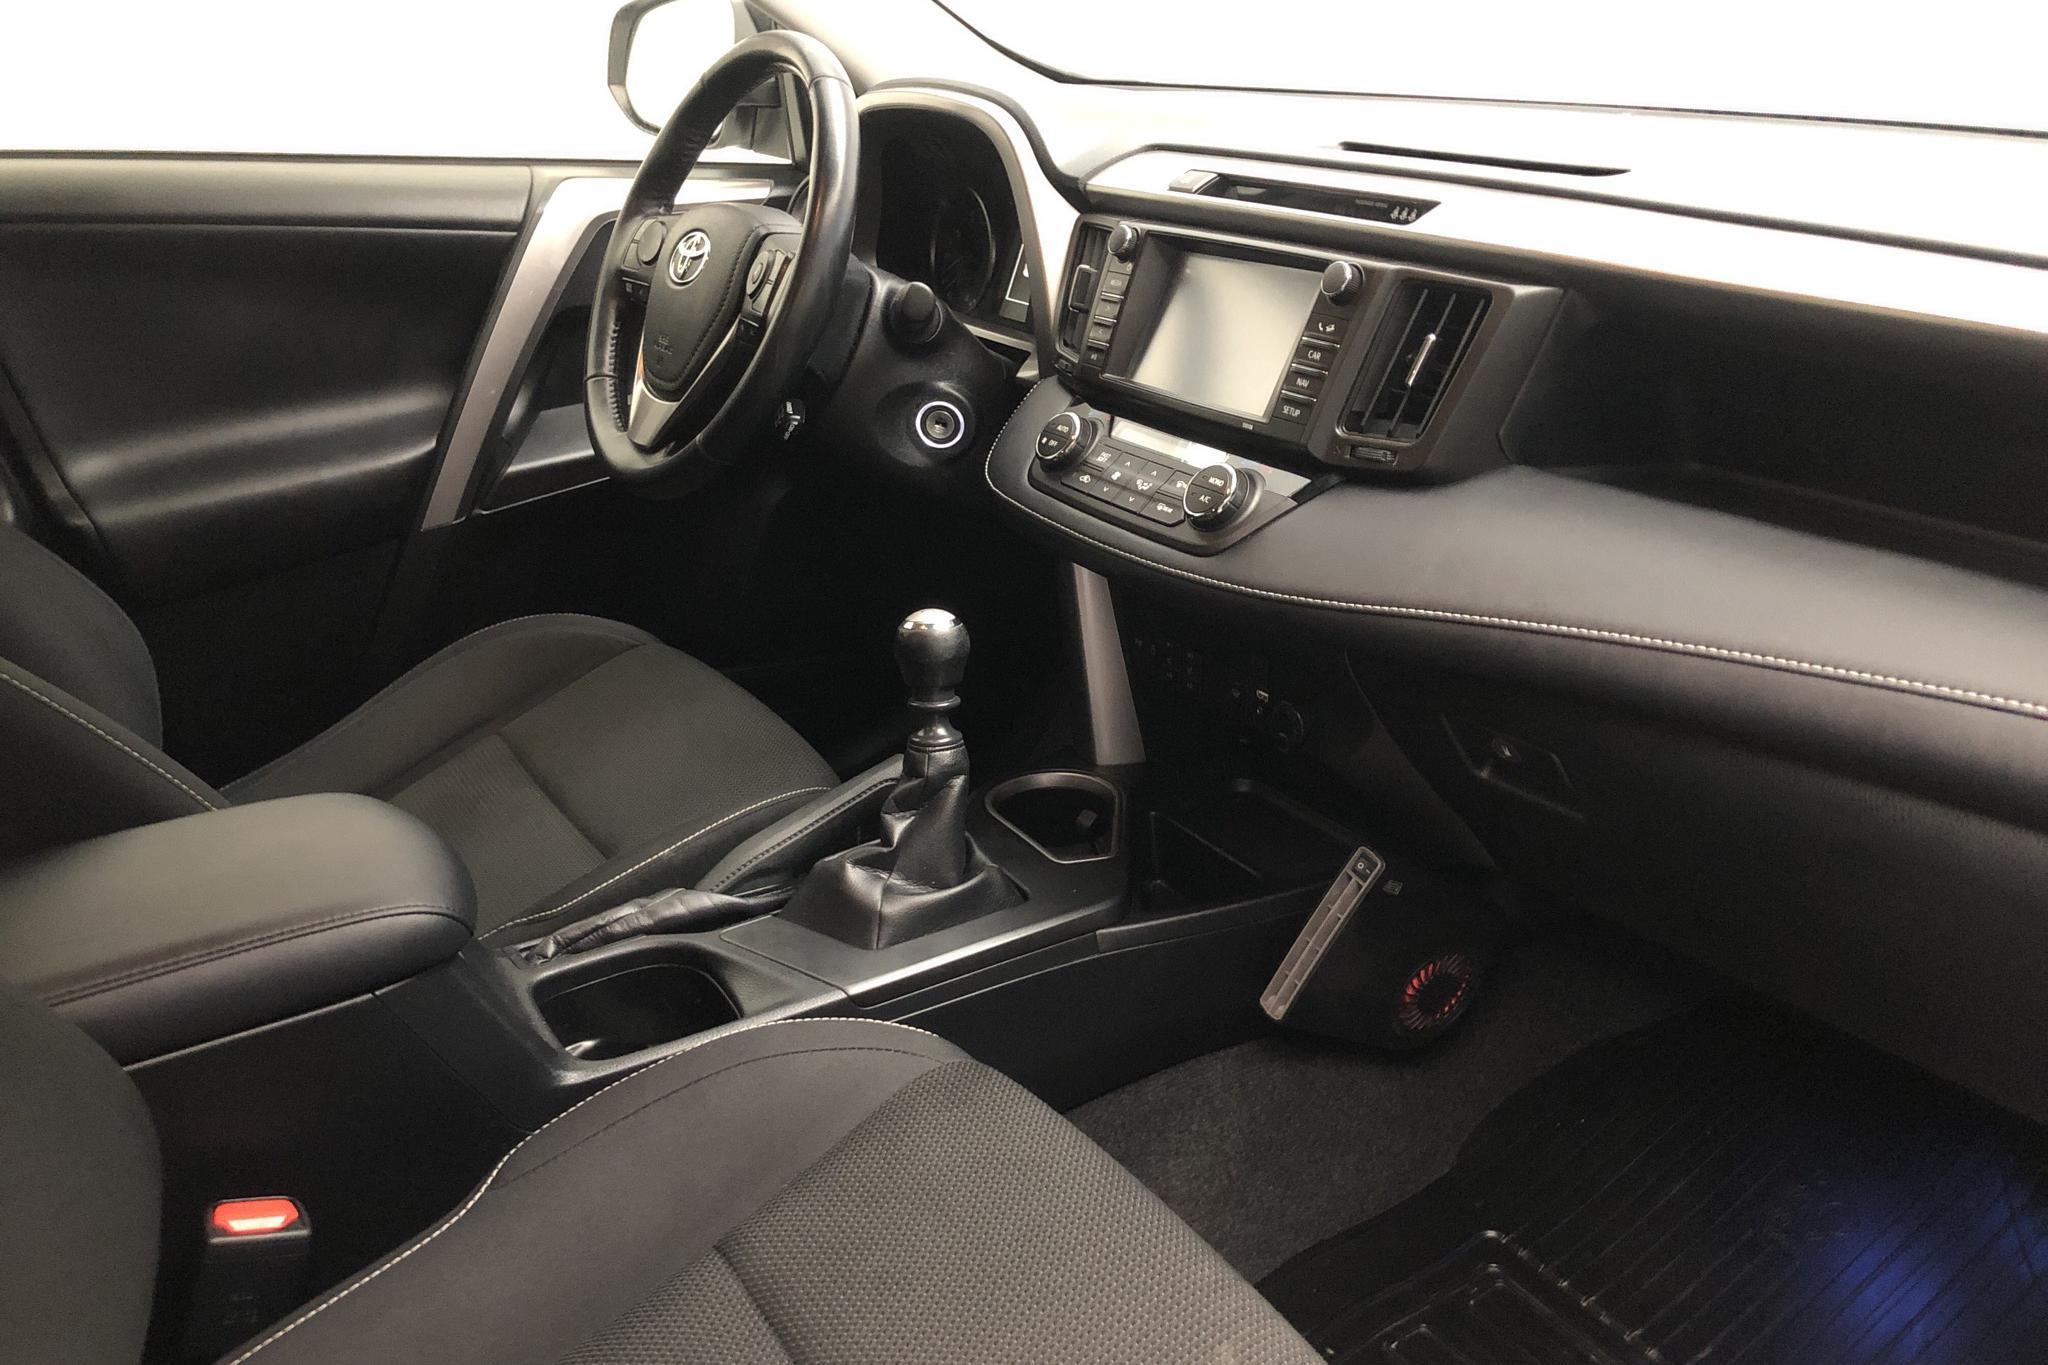 Toyota RAV4 2.0 VVT-i AWD (151hk) - 120 210 km - Manual - white - 2017